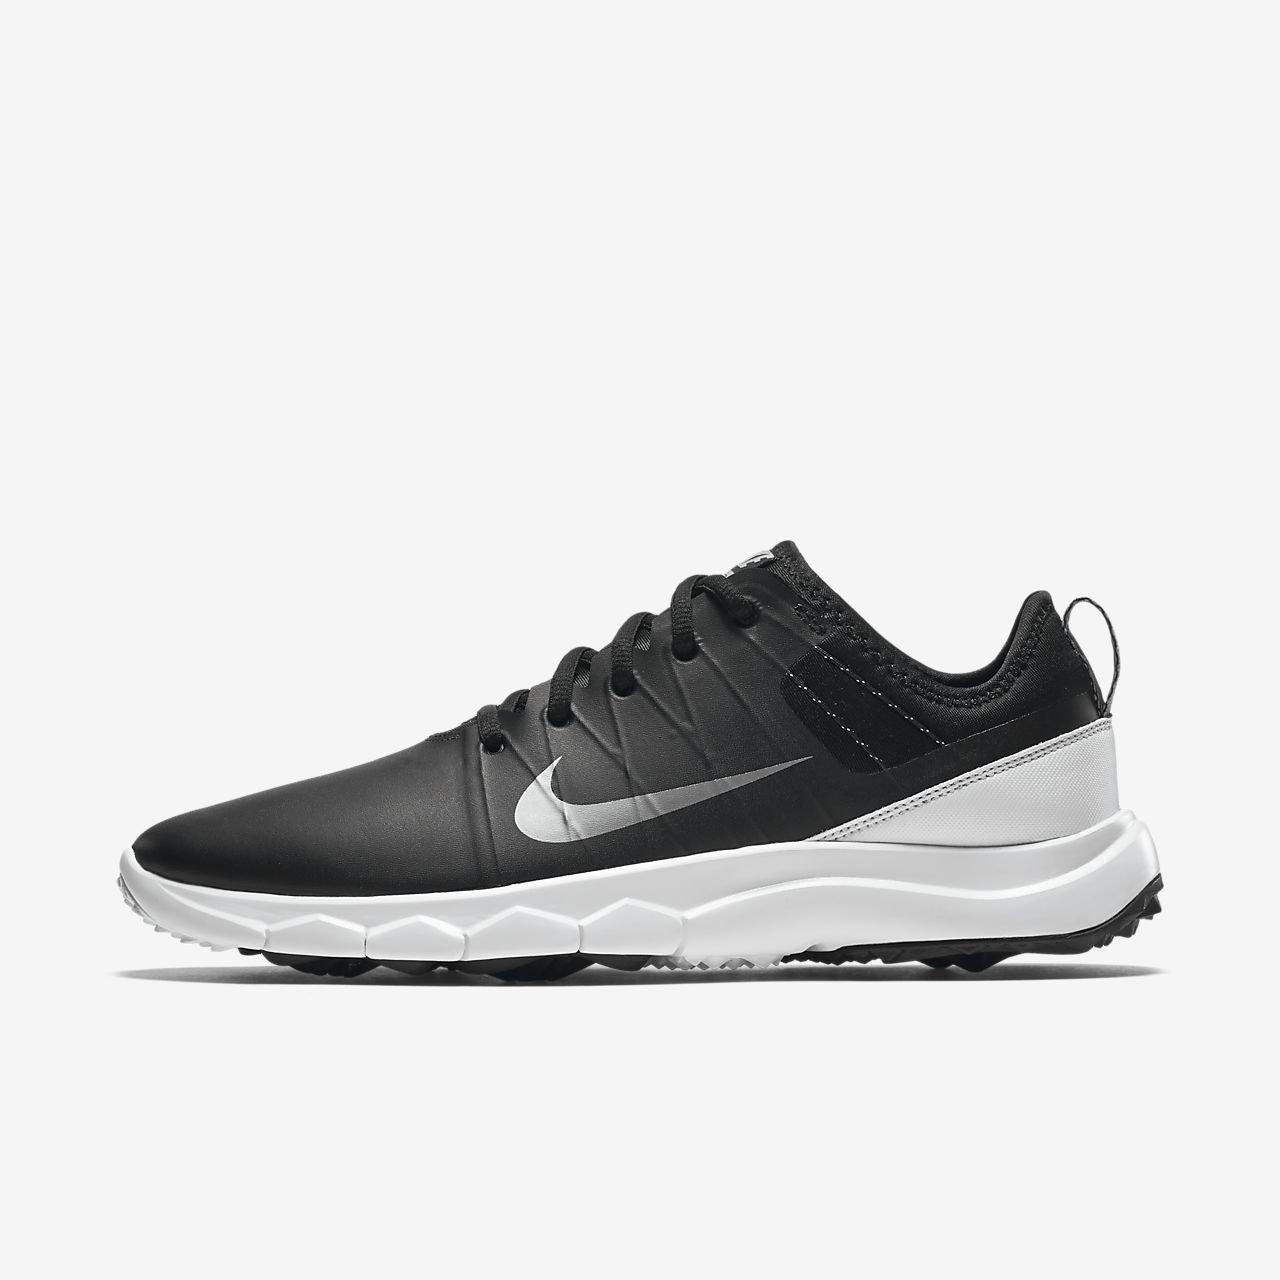 Damskie buty do golfa Nike FI Impact 2